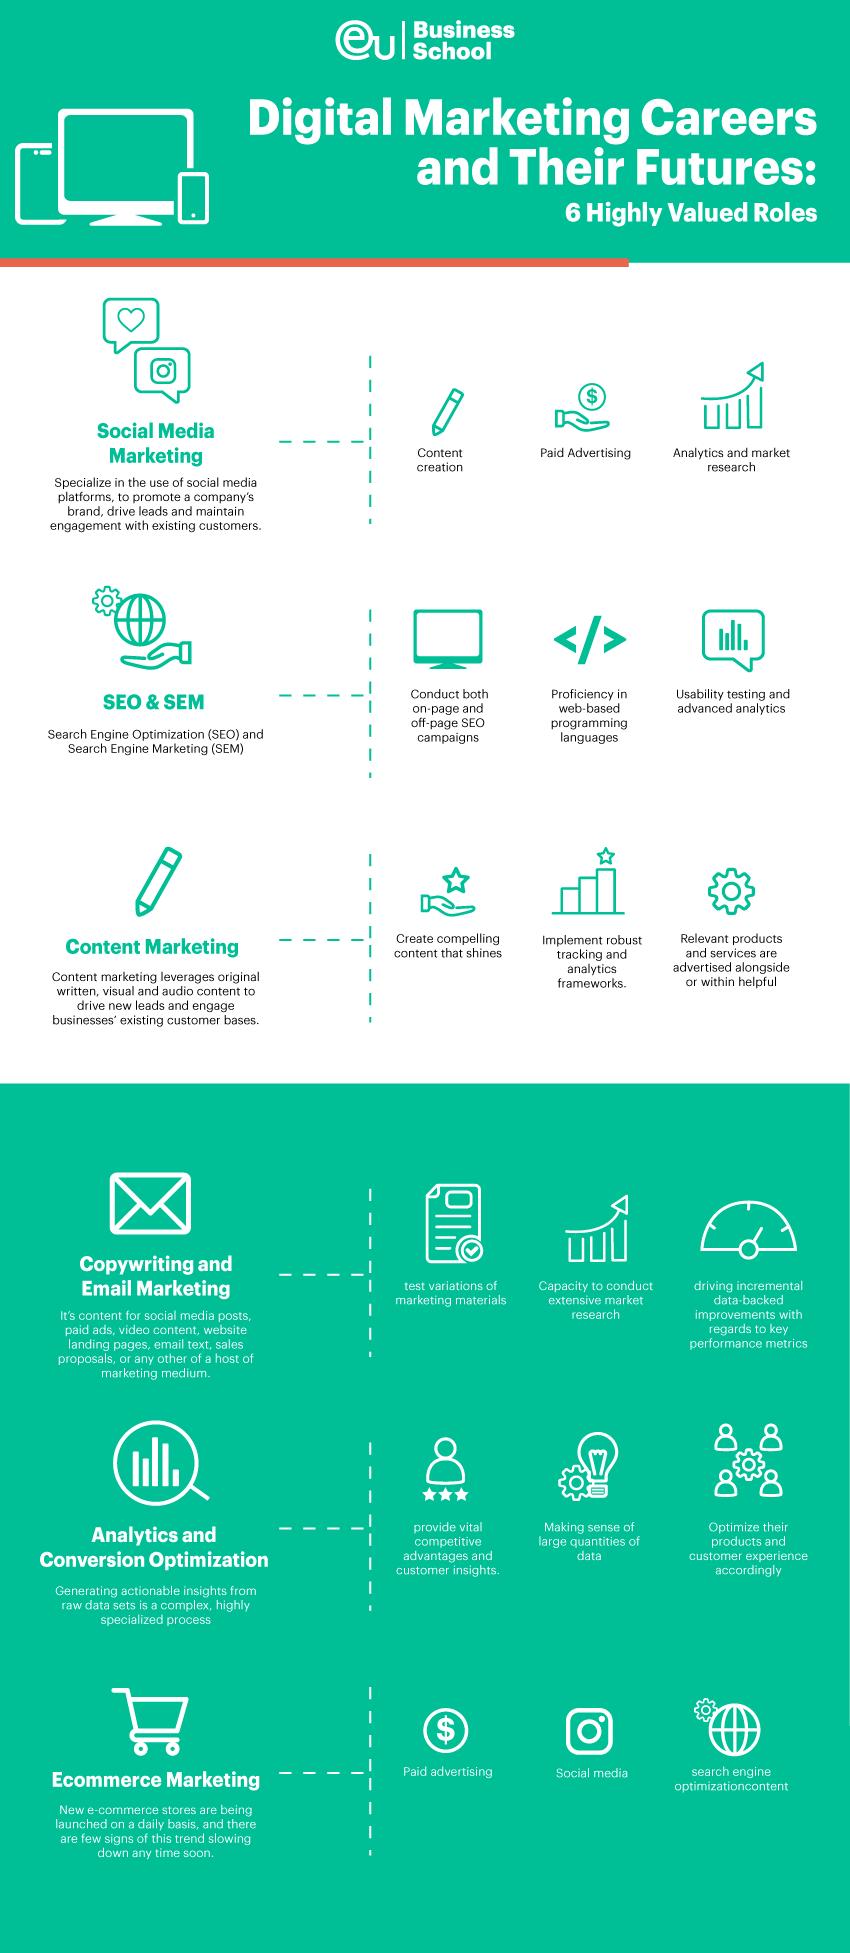 EU-business-school-Digital-Marketing-careers